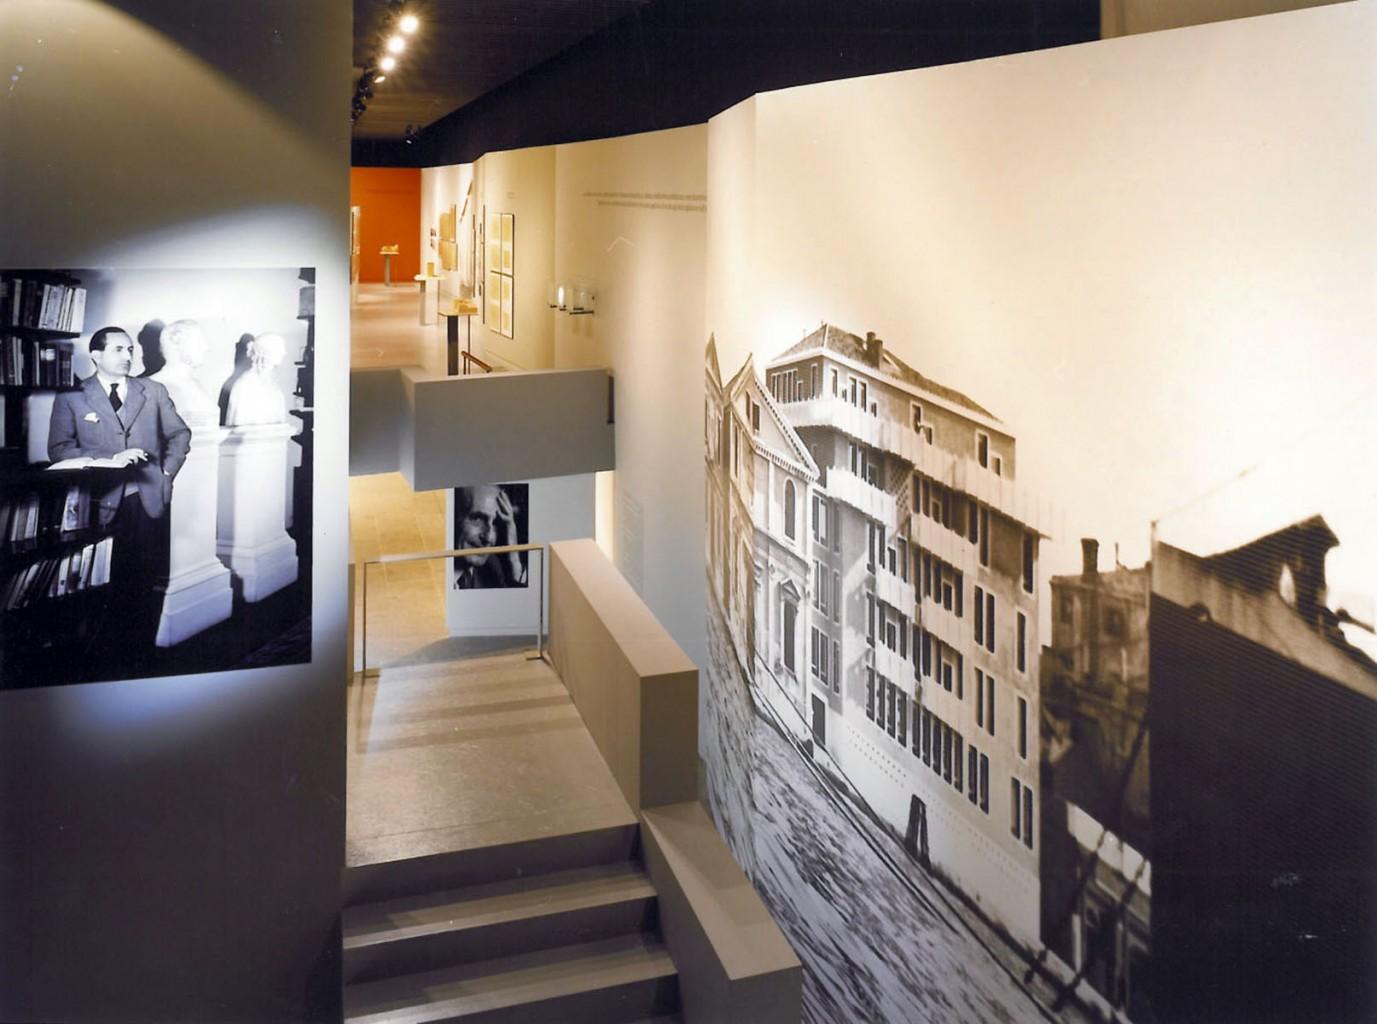 Exposición Ignazio Gardella 1905-1999, Arquitectura a través de un Siglo Blanca Lleó 01b